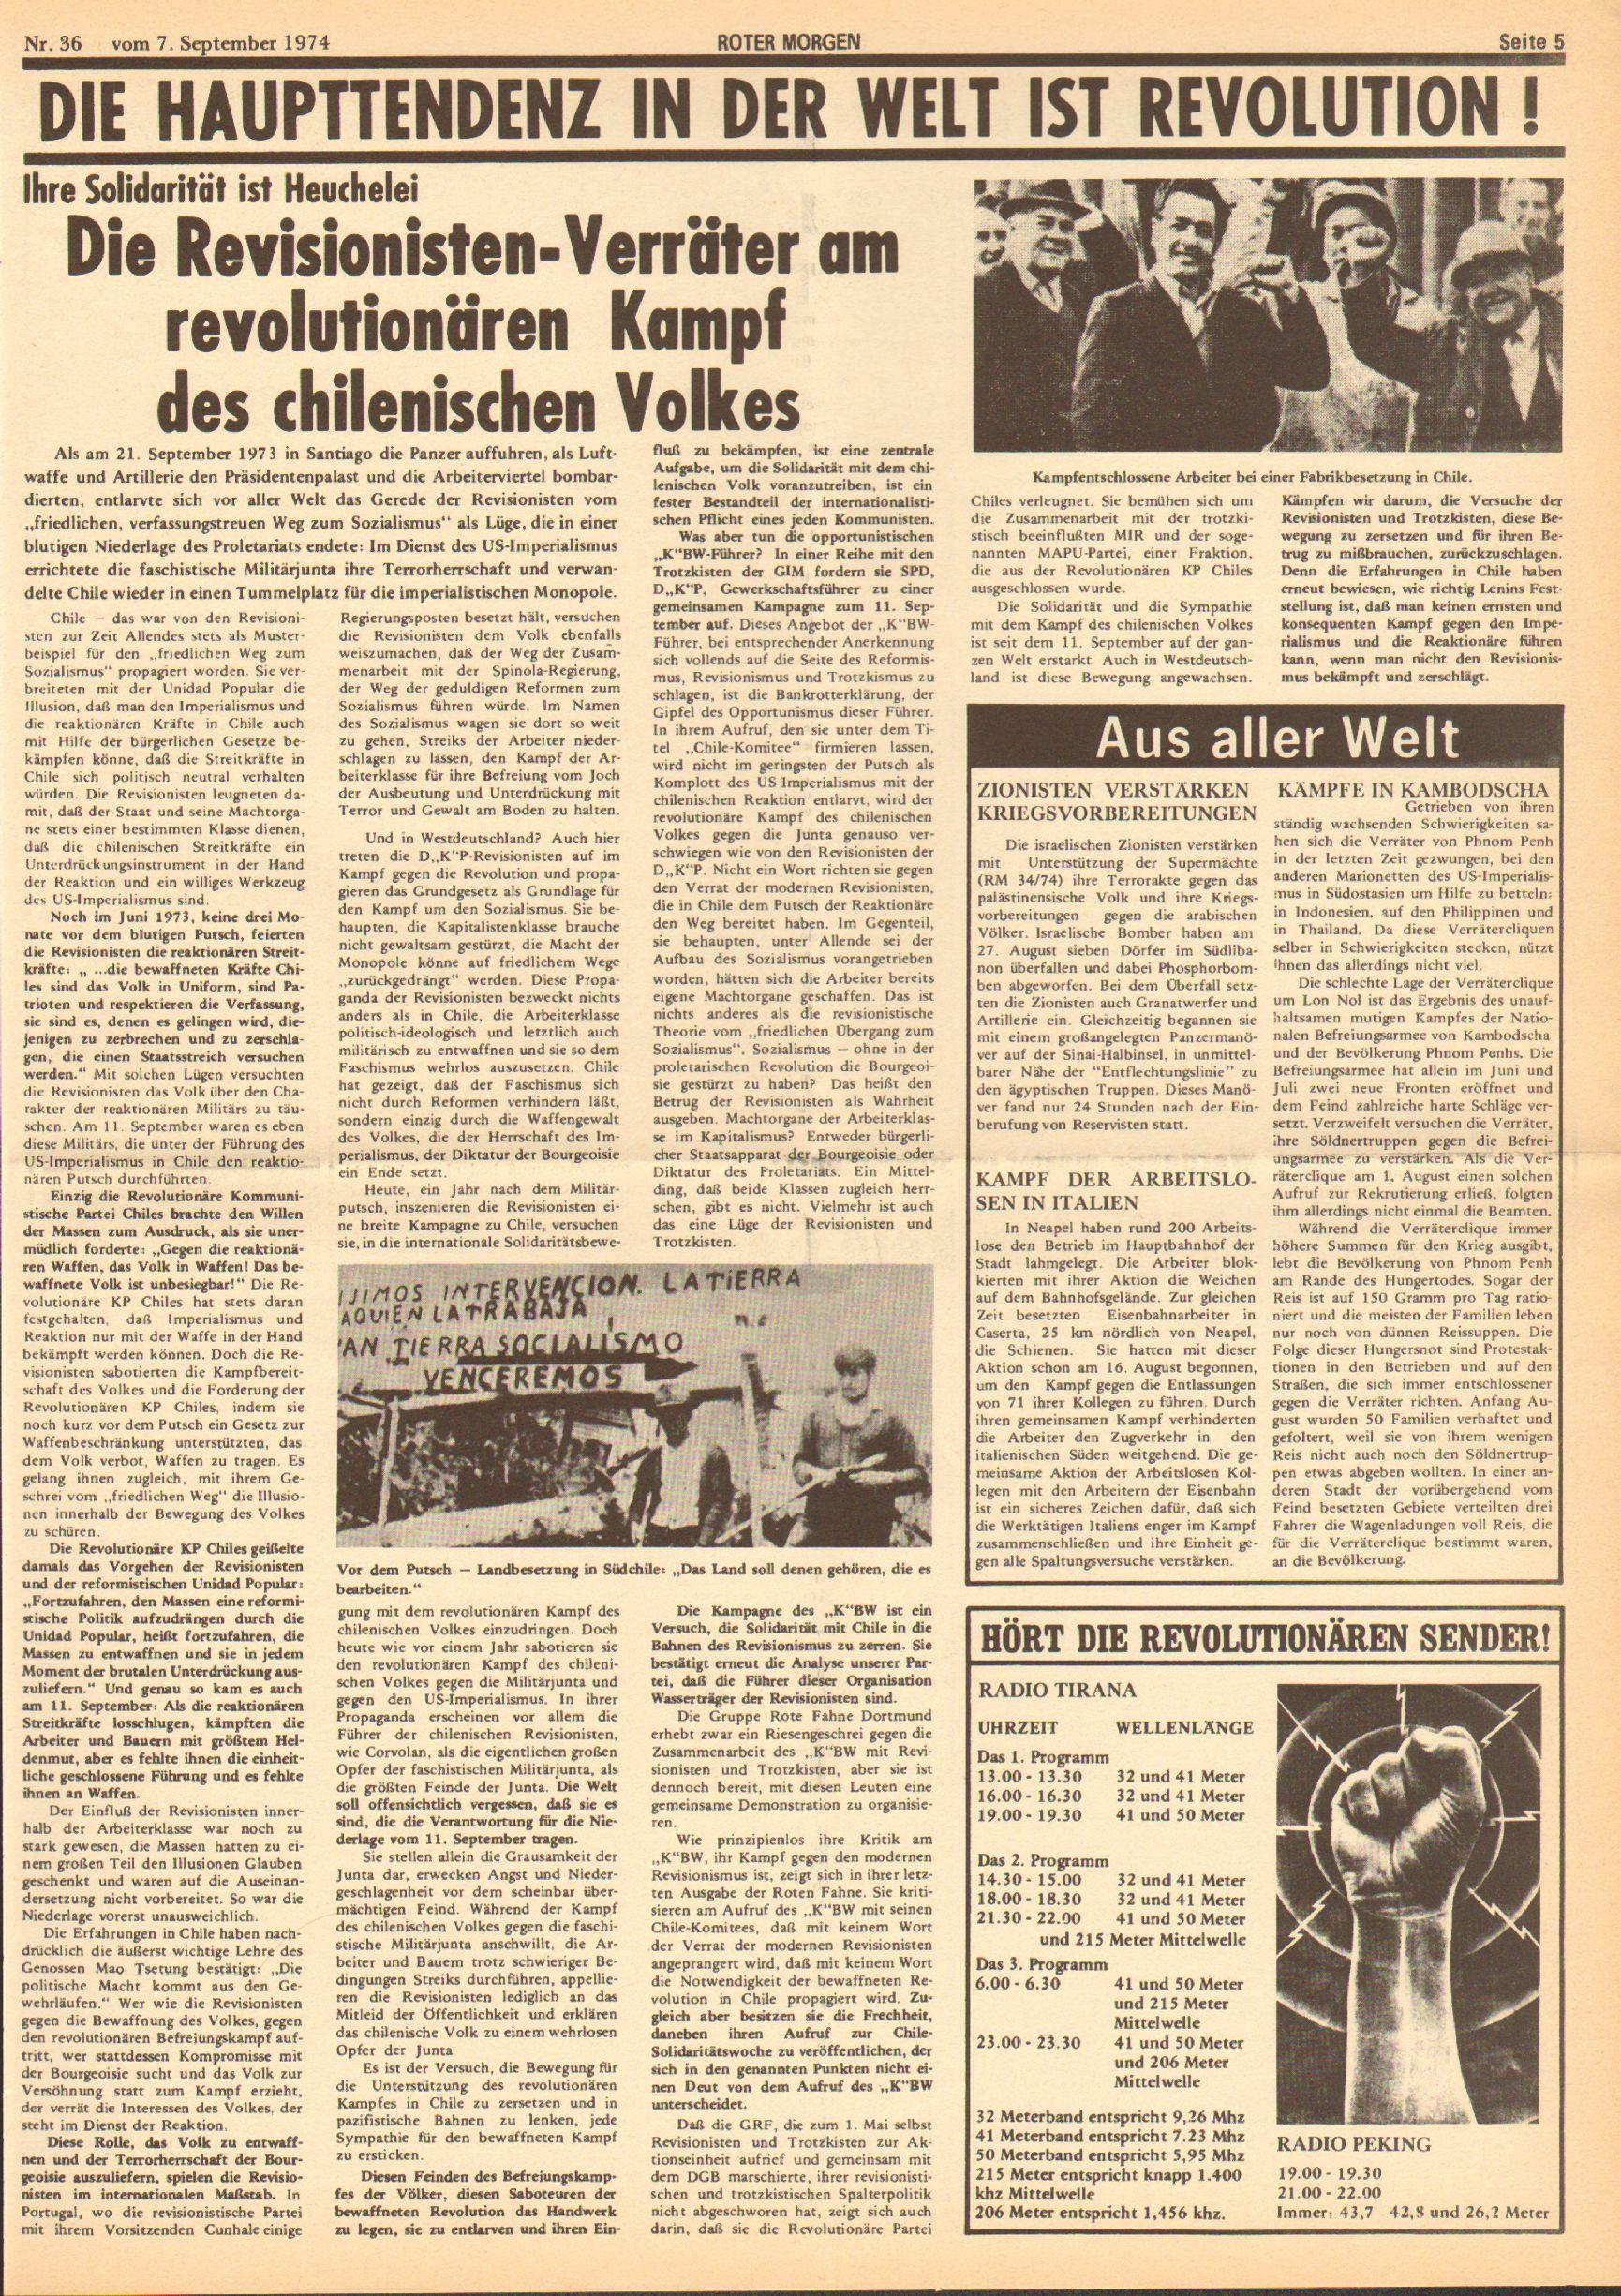 Roter Morgen, 8. Jg., 7. September 1974, Nr. 36, Seite 5